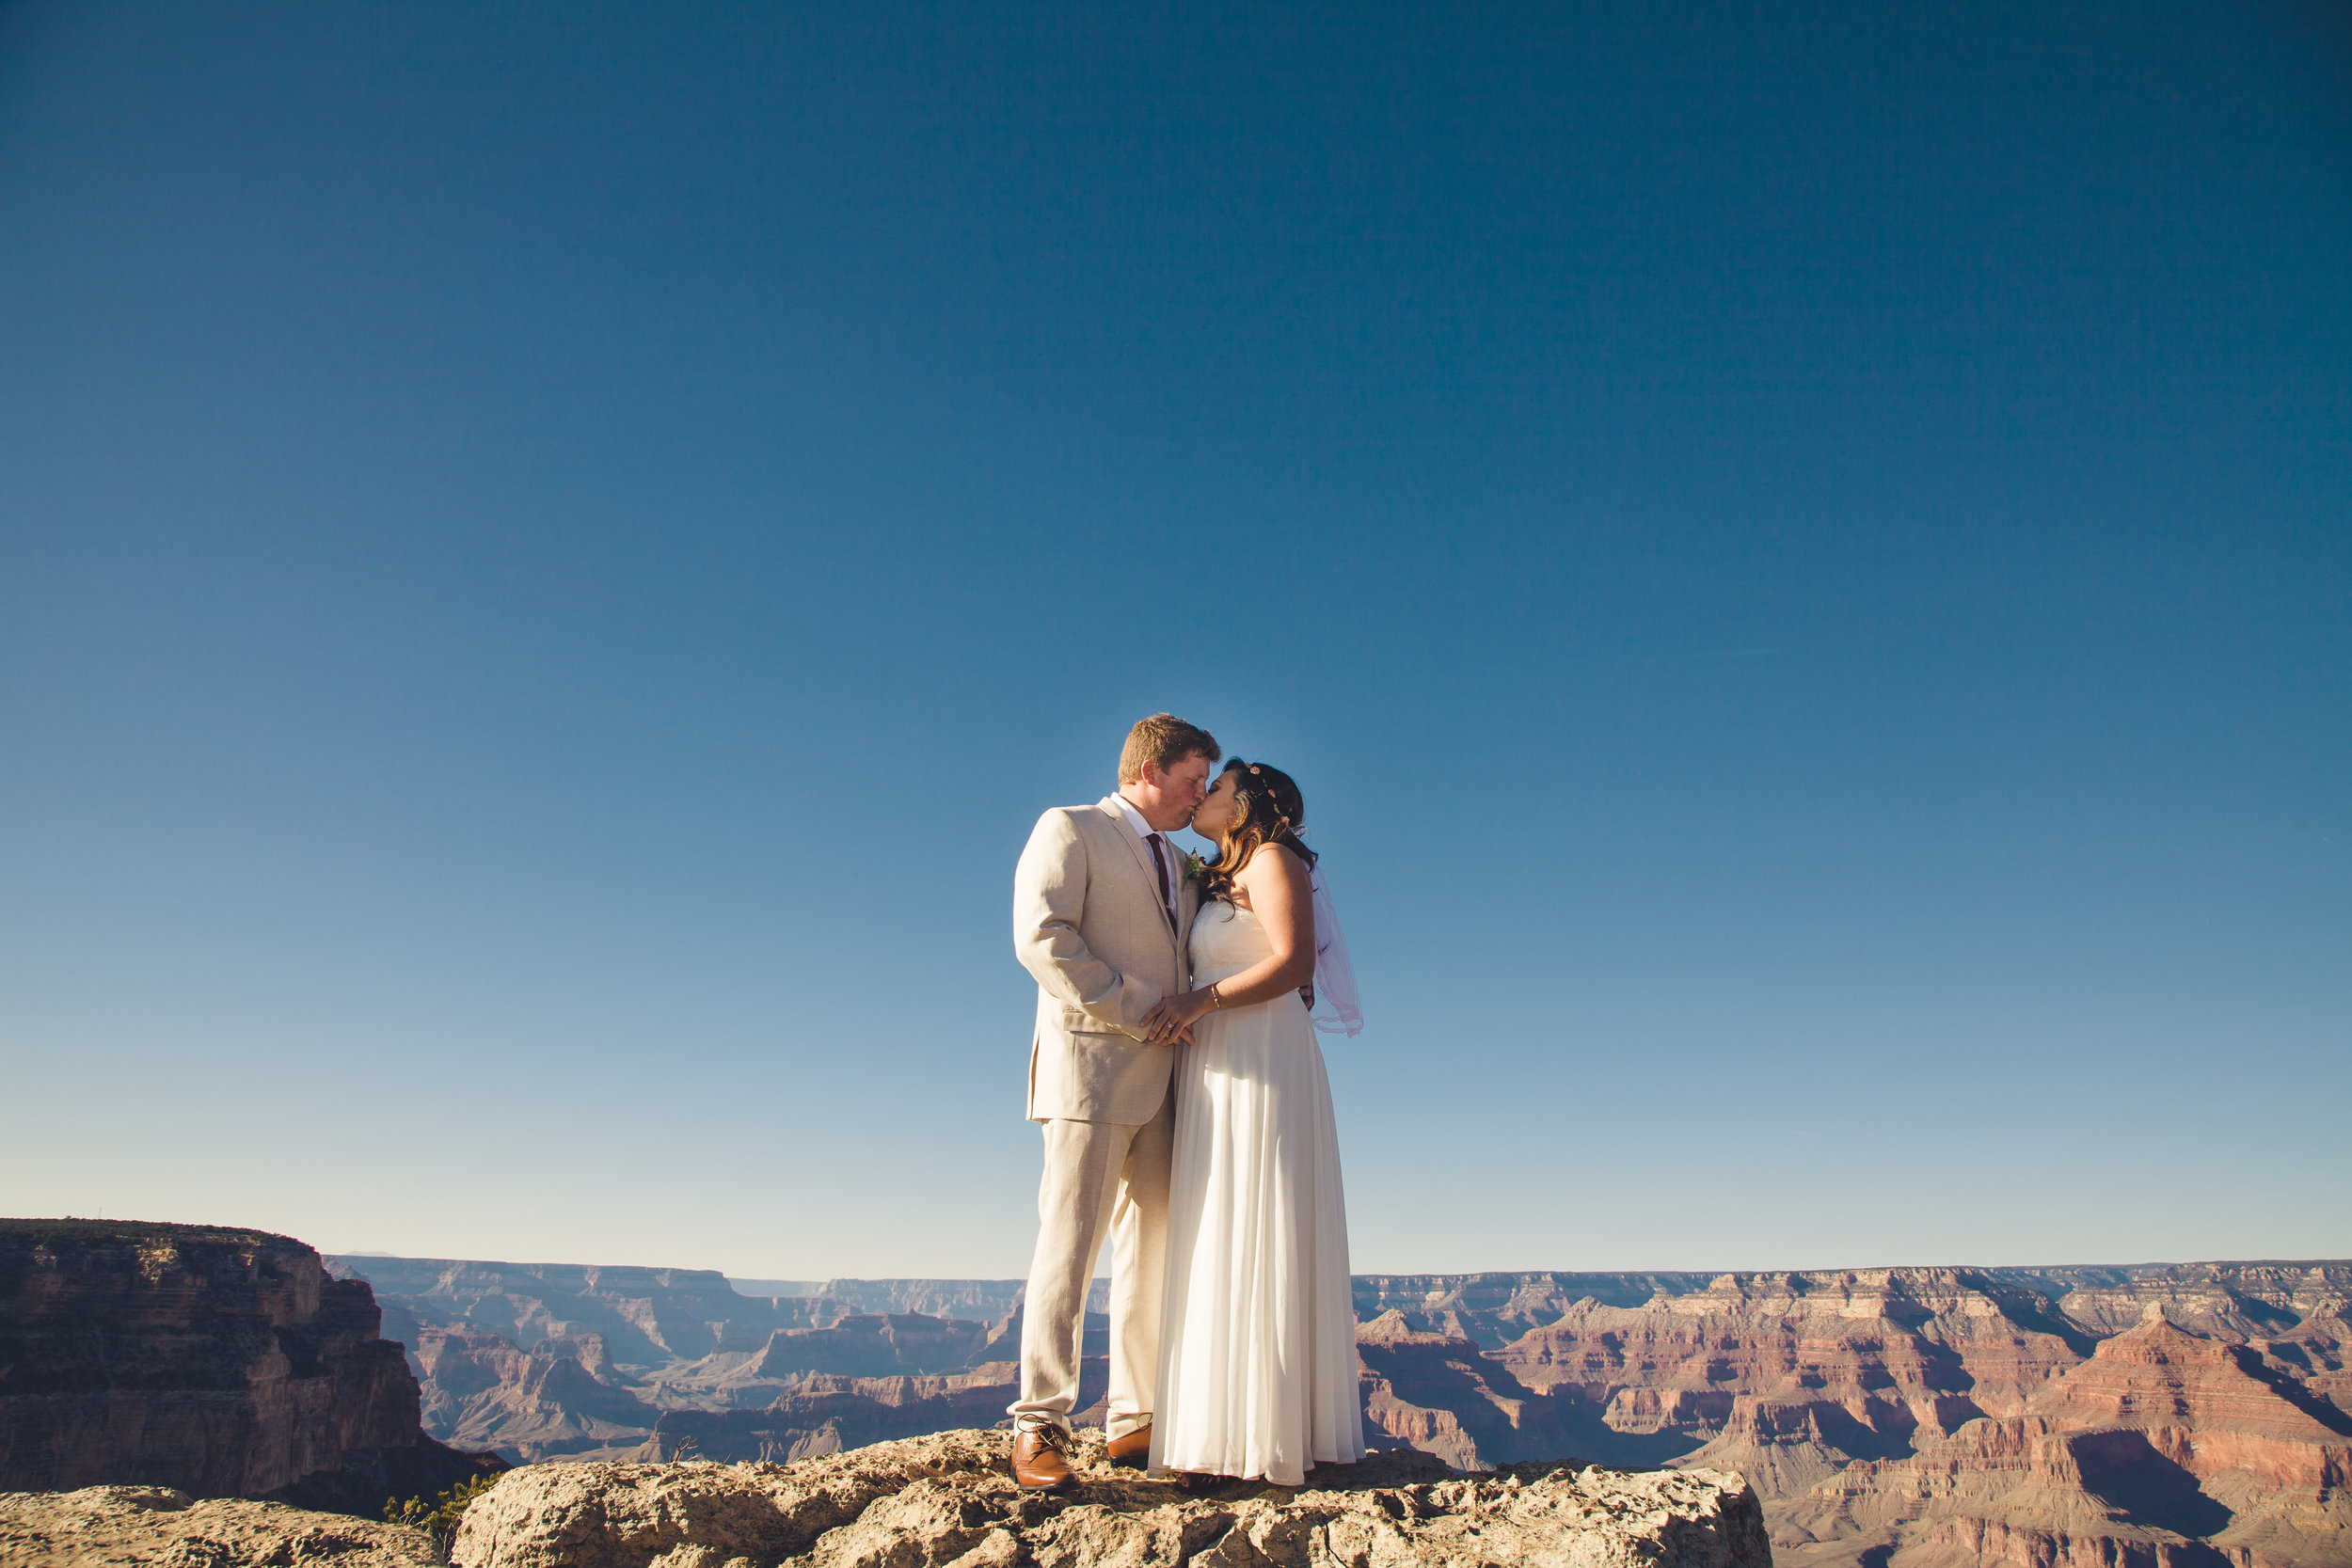 Grand Canyon wedding photographer at Granduer Point.